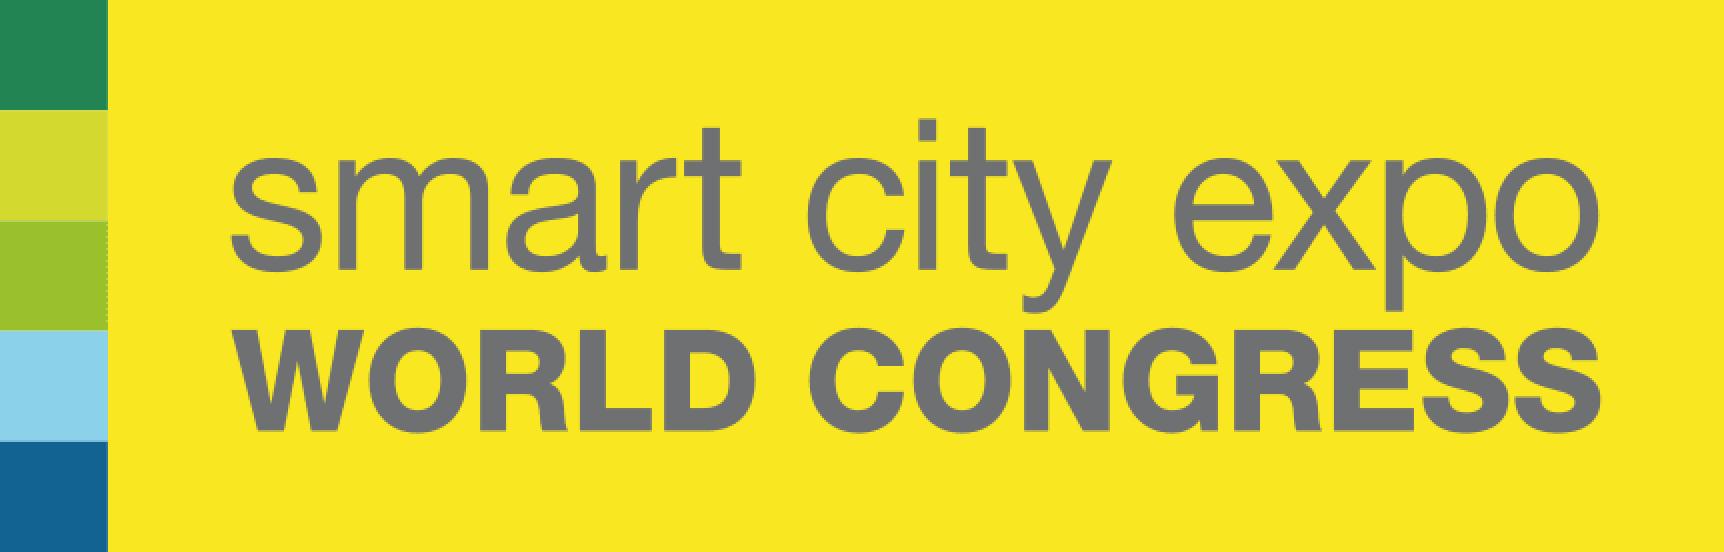 Wallspot Post - Smart City Expo World Congress